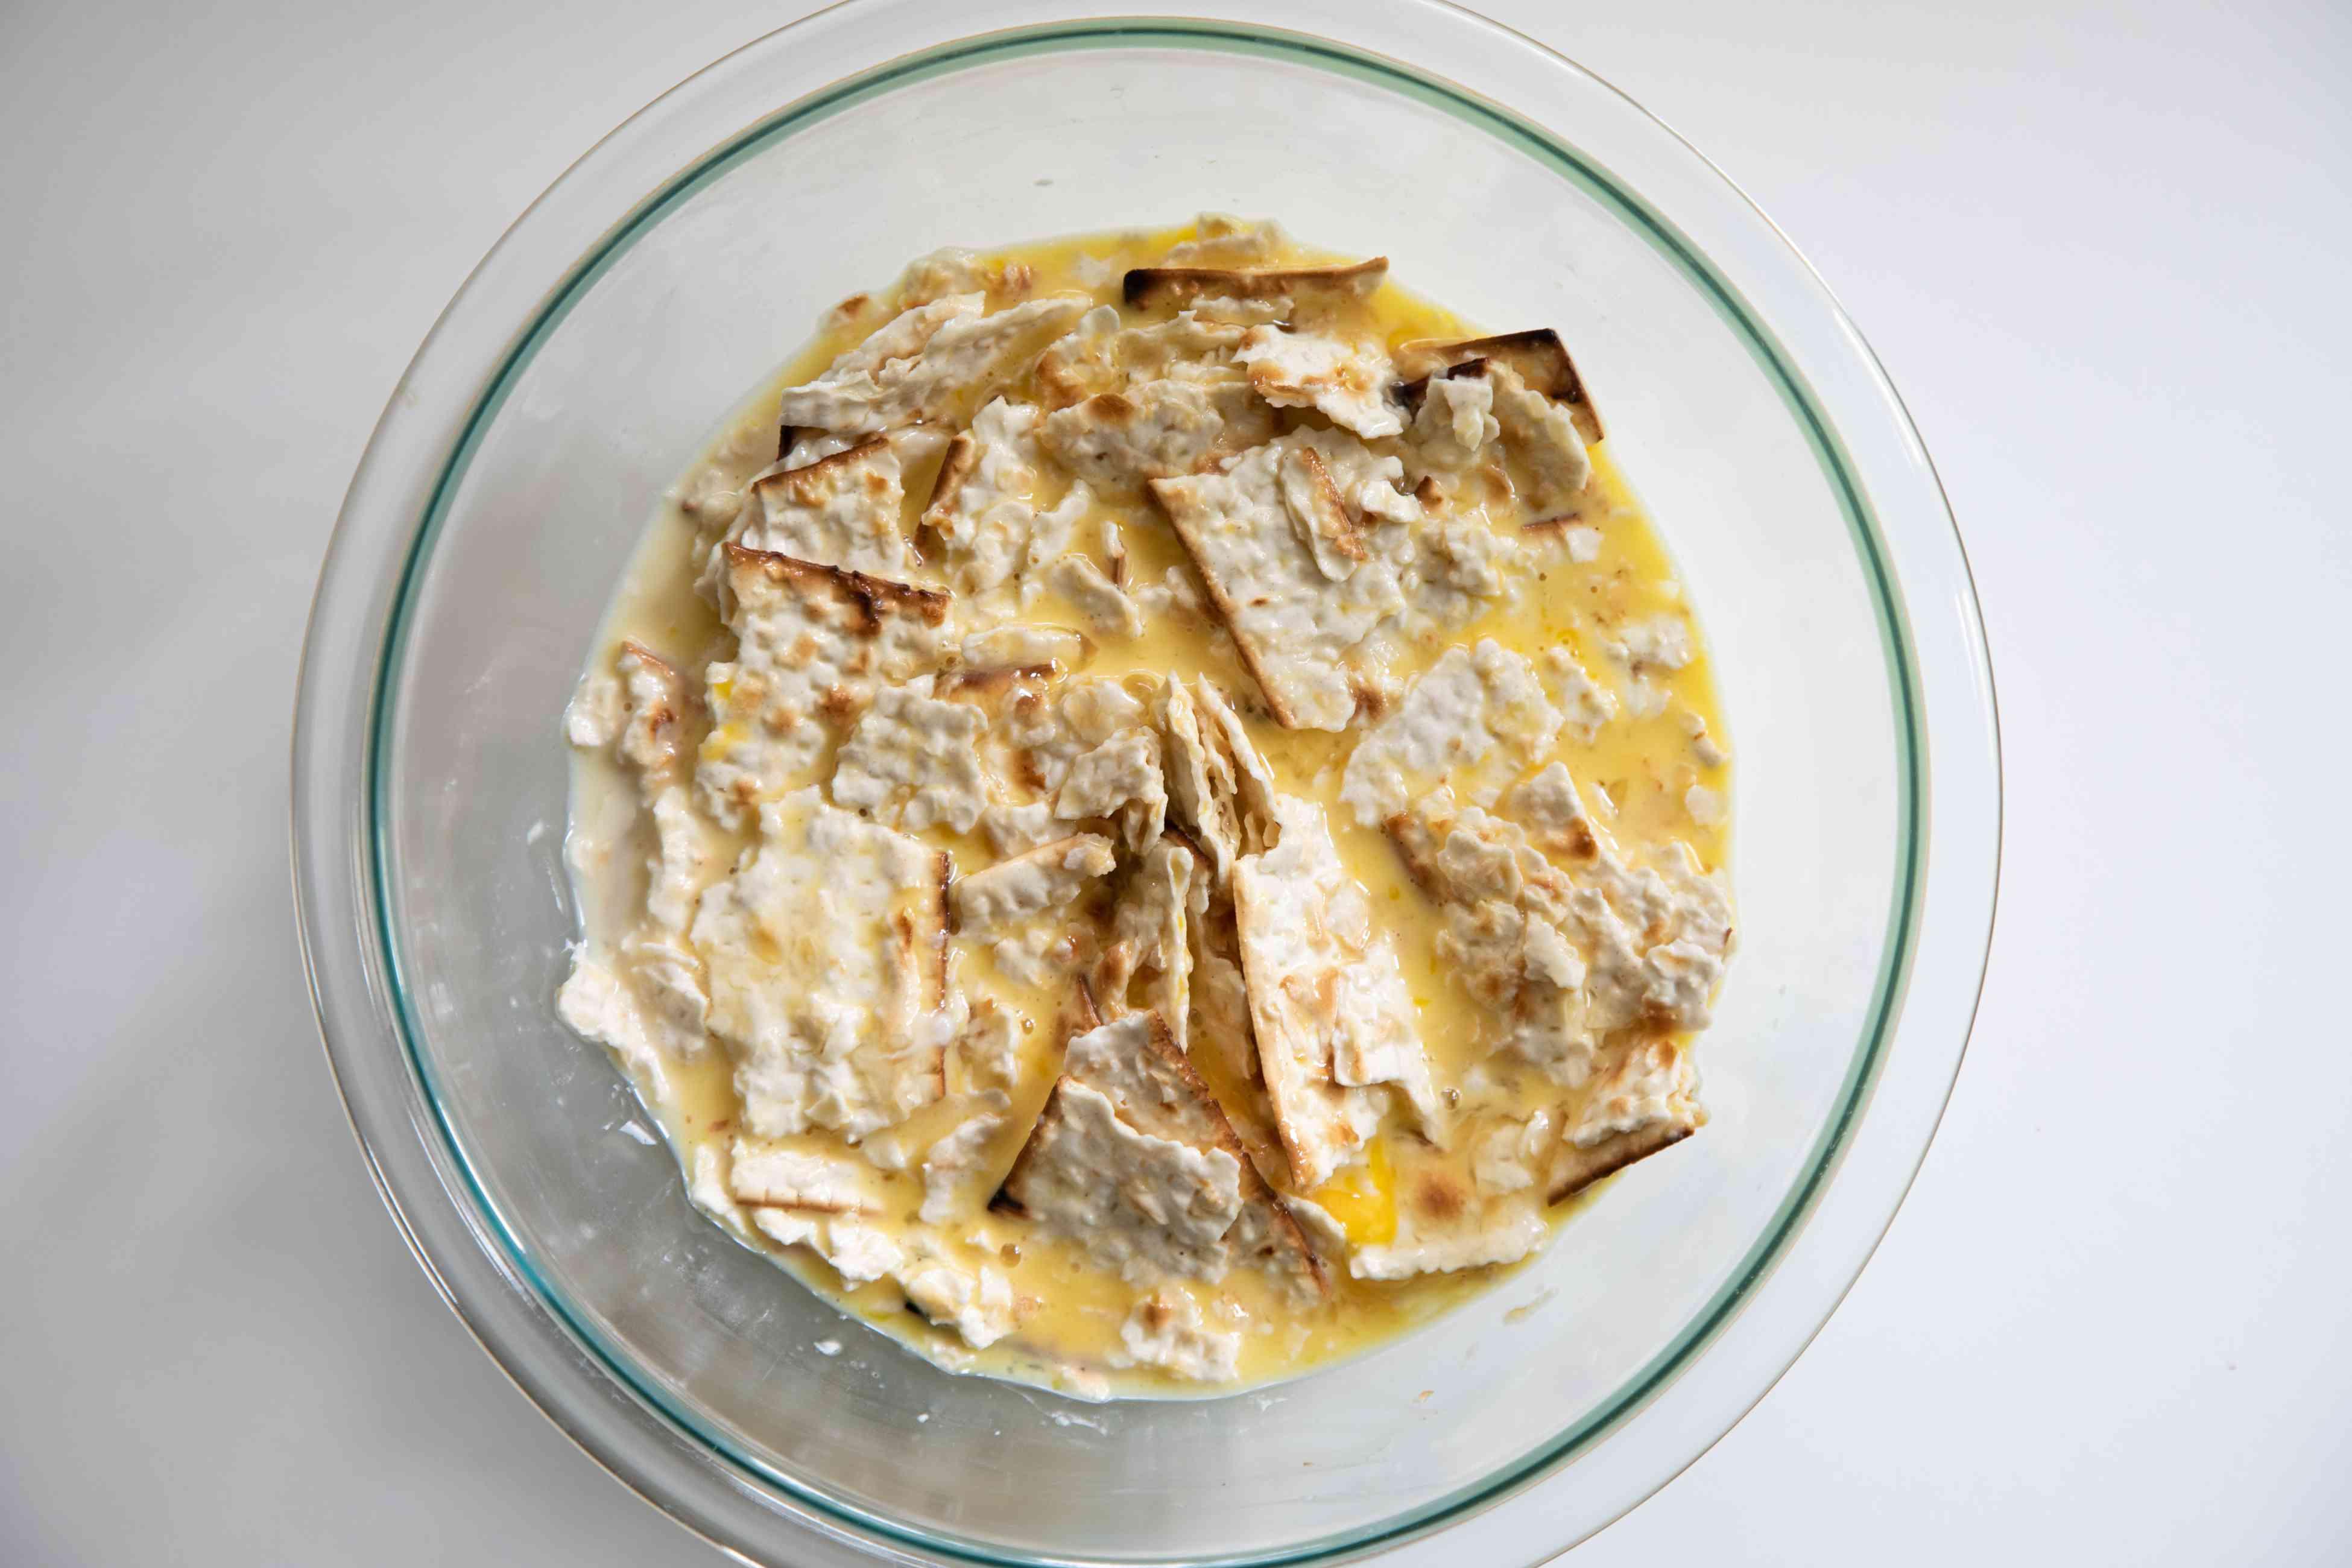 matzah brei soaking in a bowl